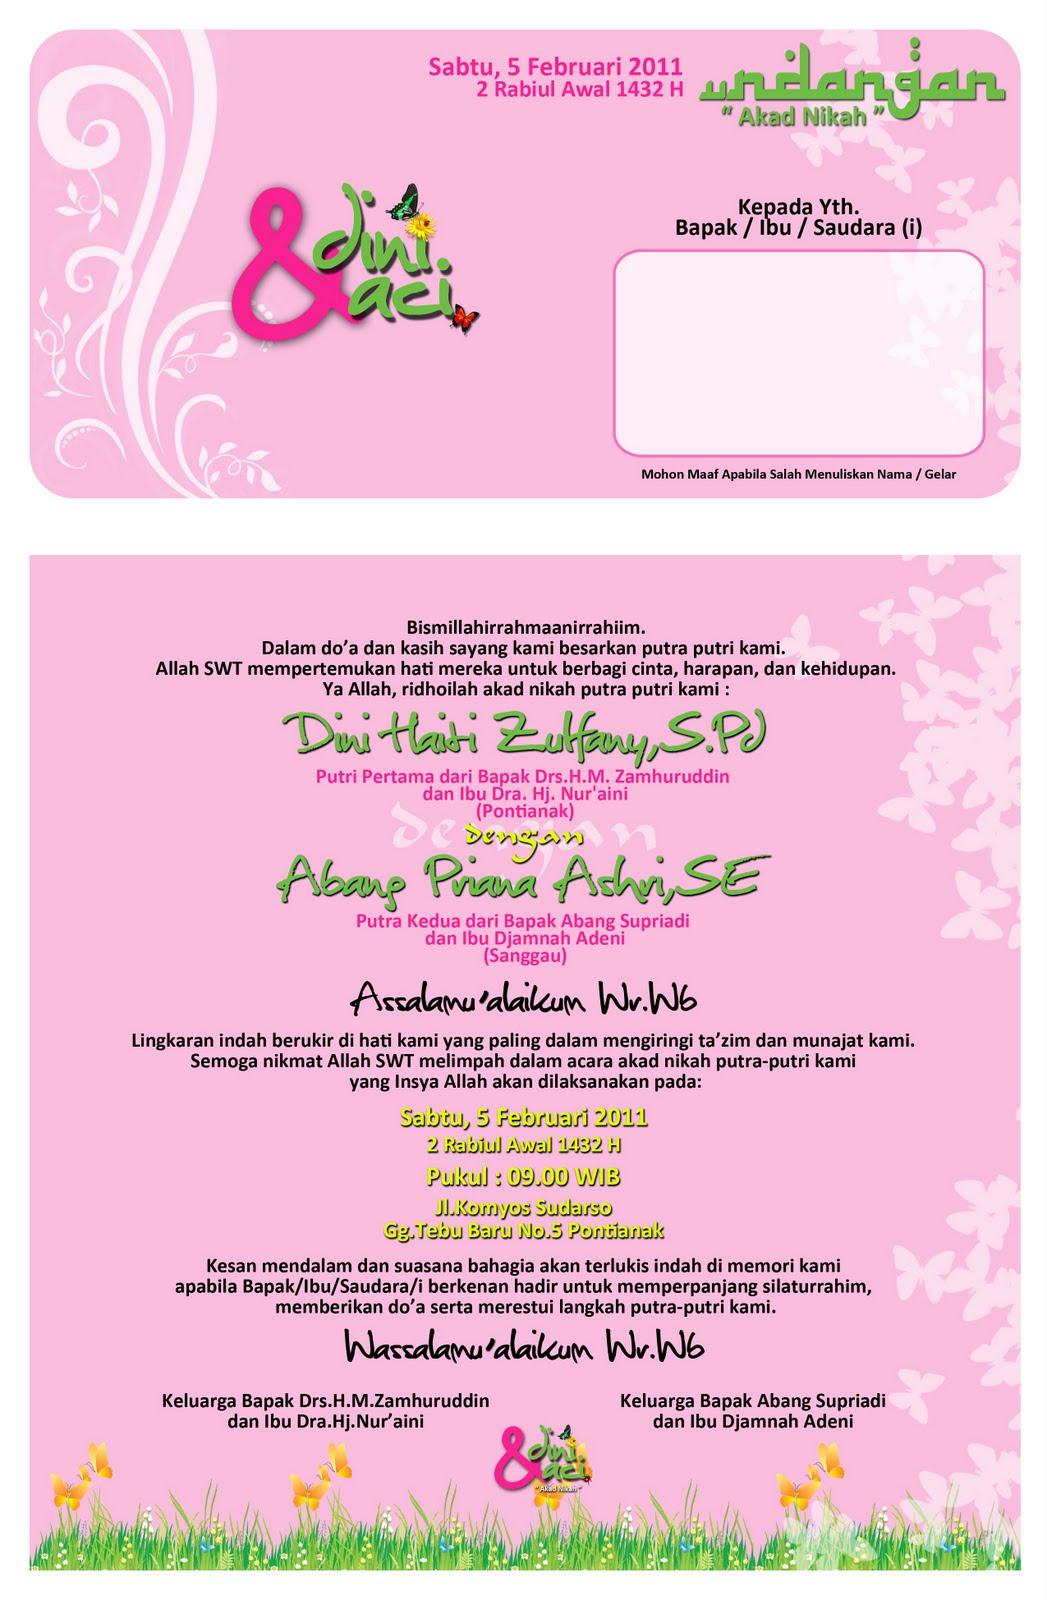 Vineeta's blog: nikah wedding invitation